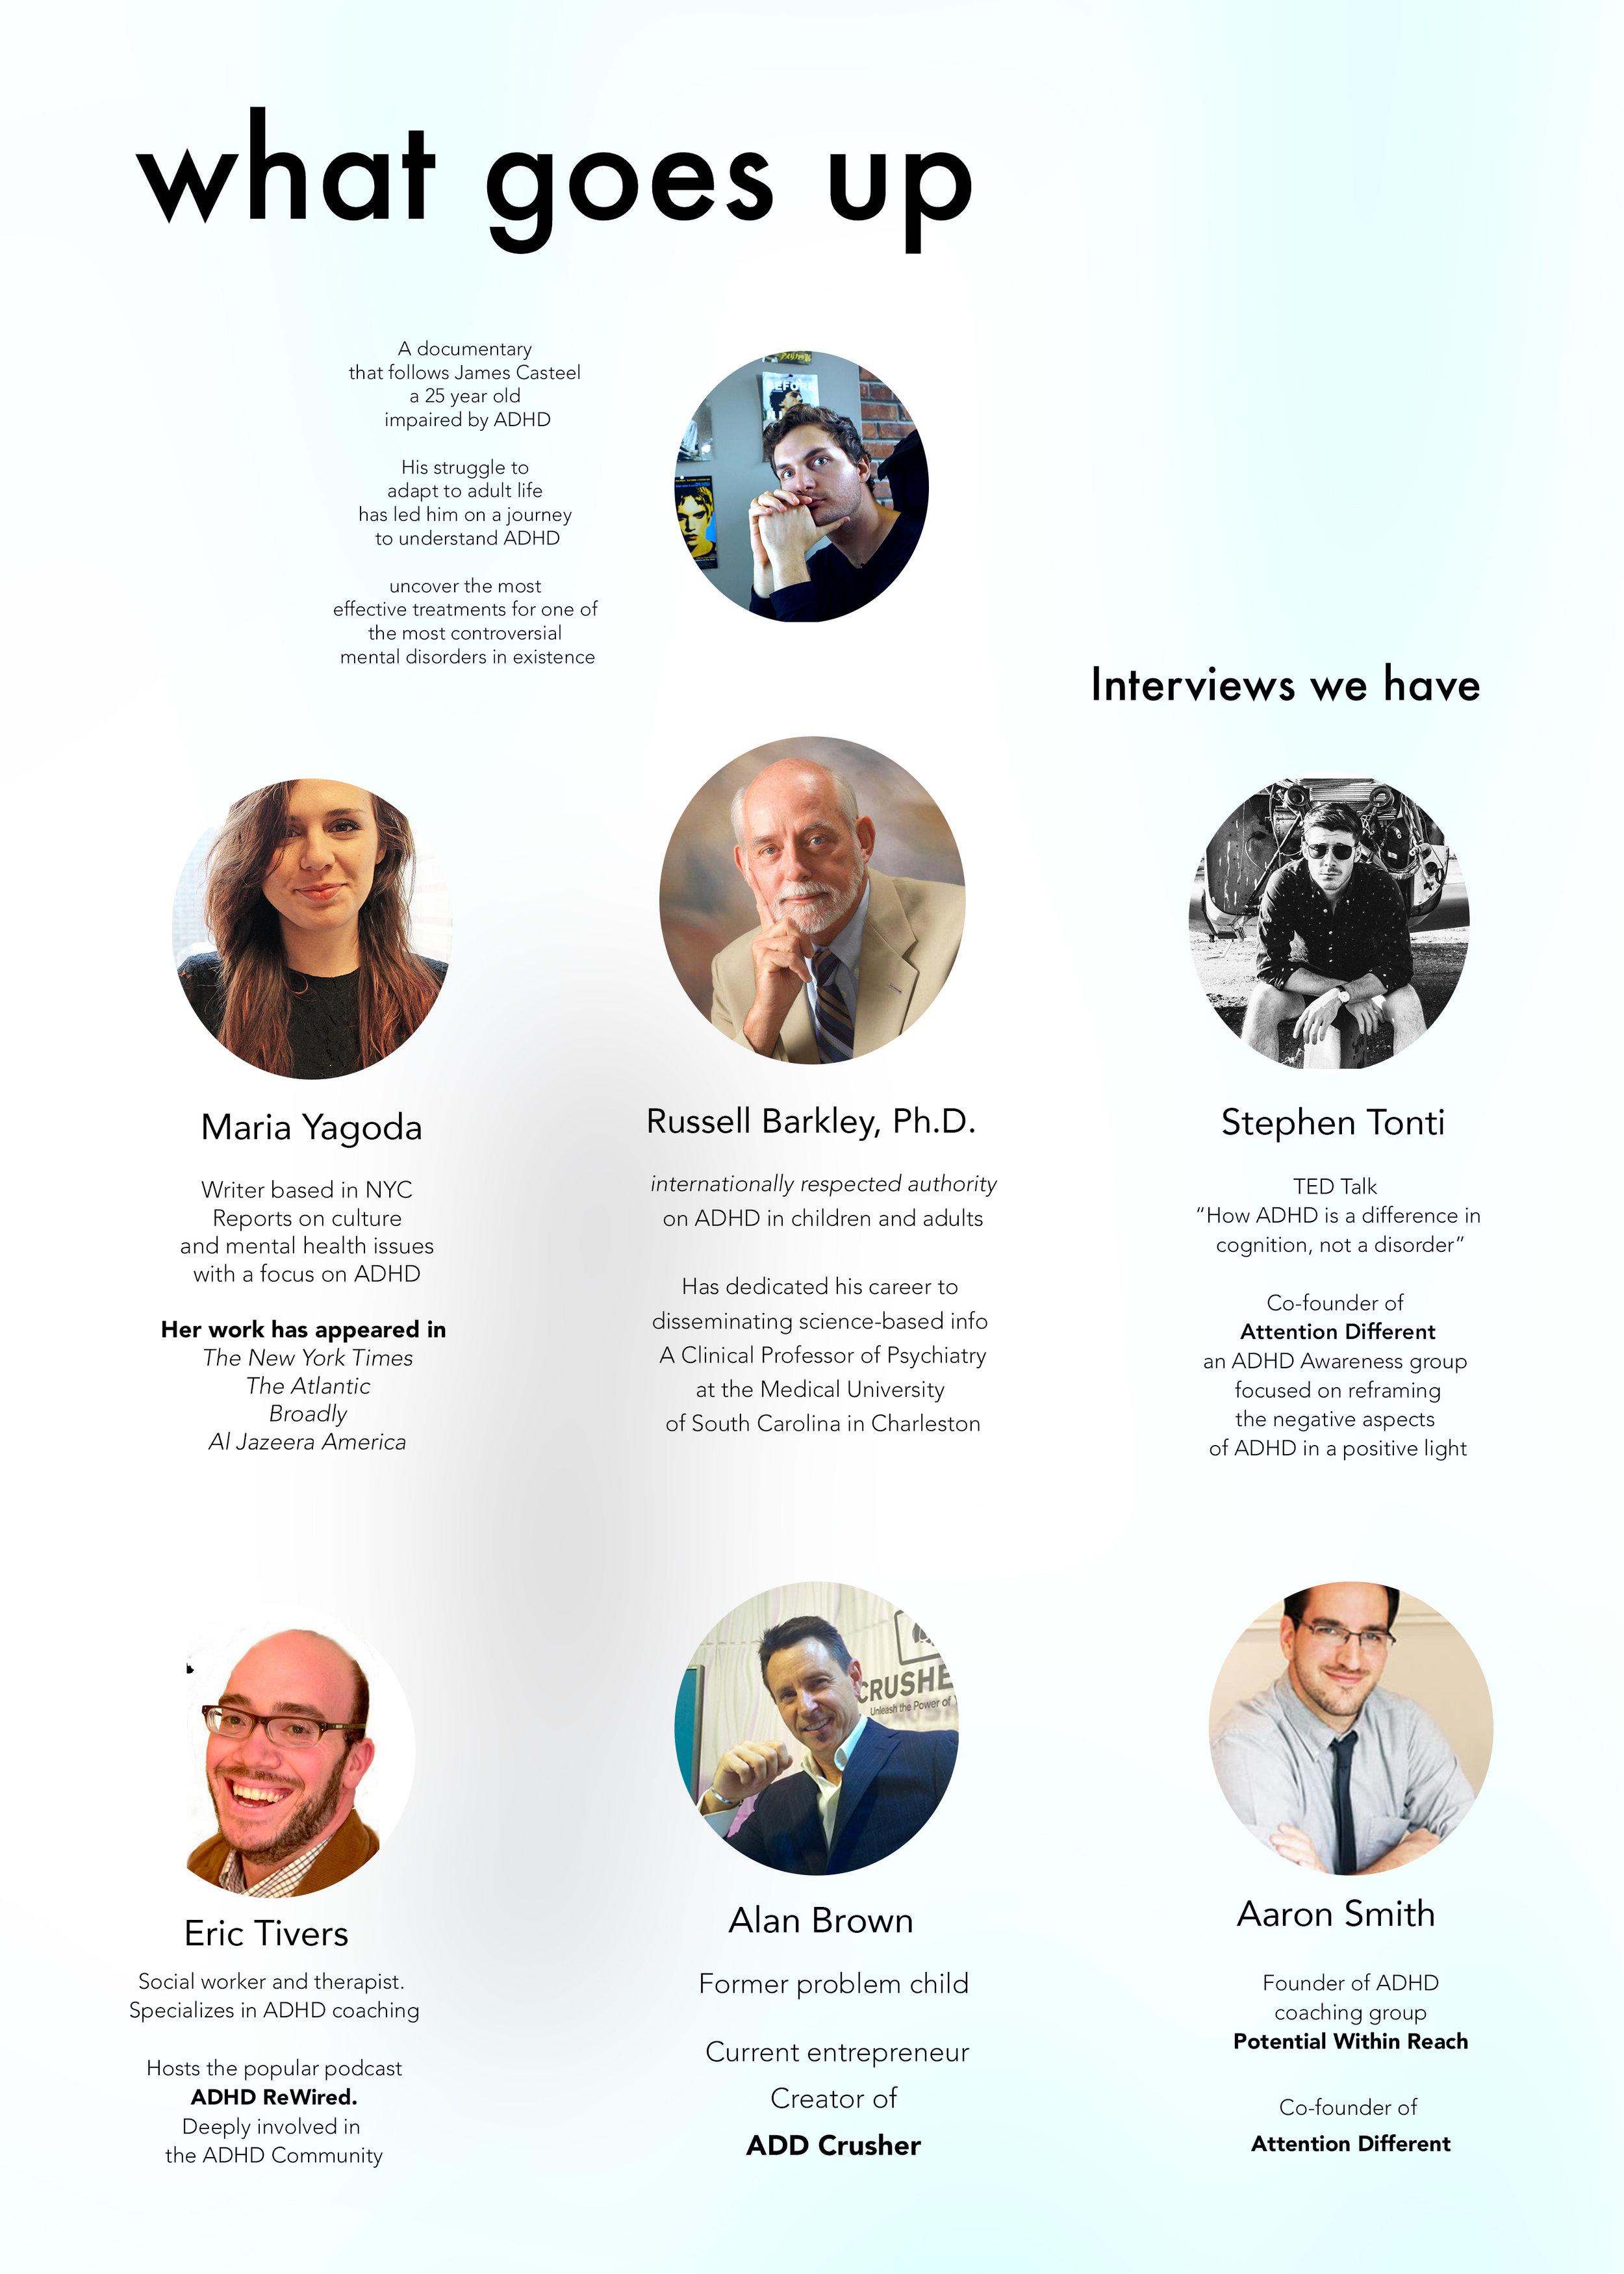 Page 01_Interviews we have.jpg